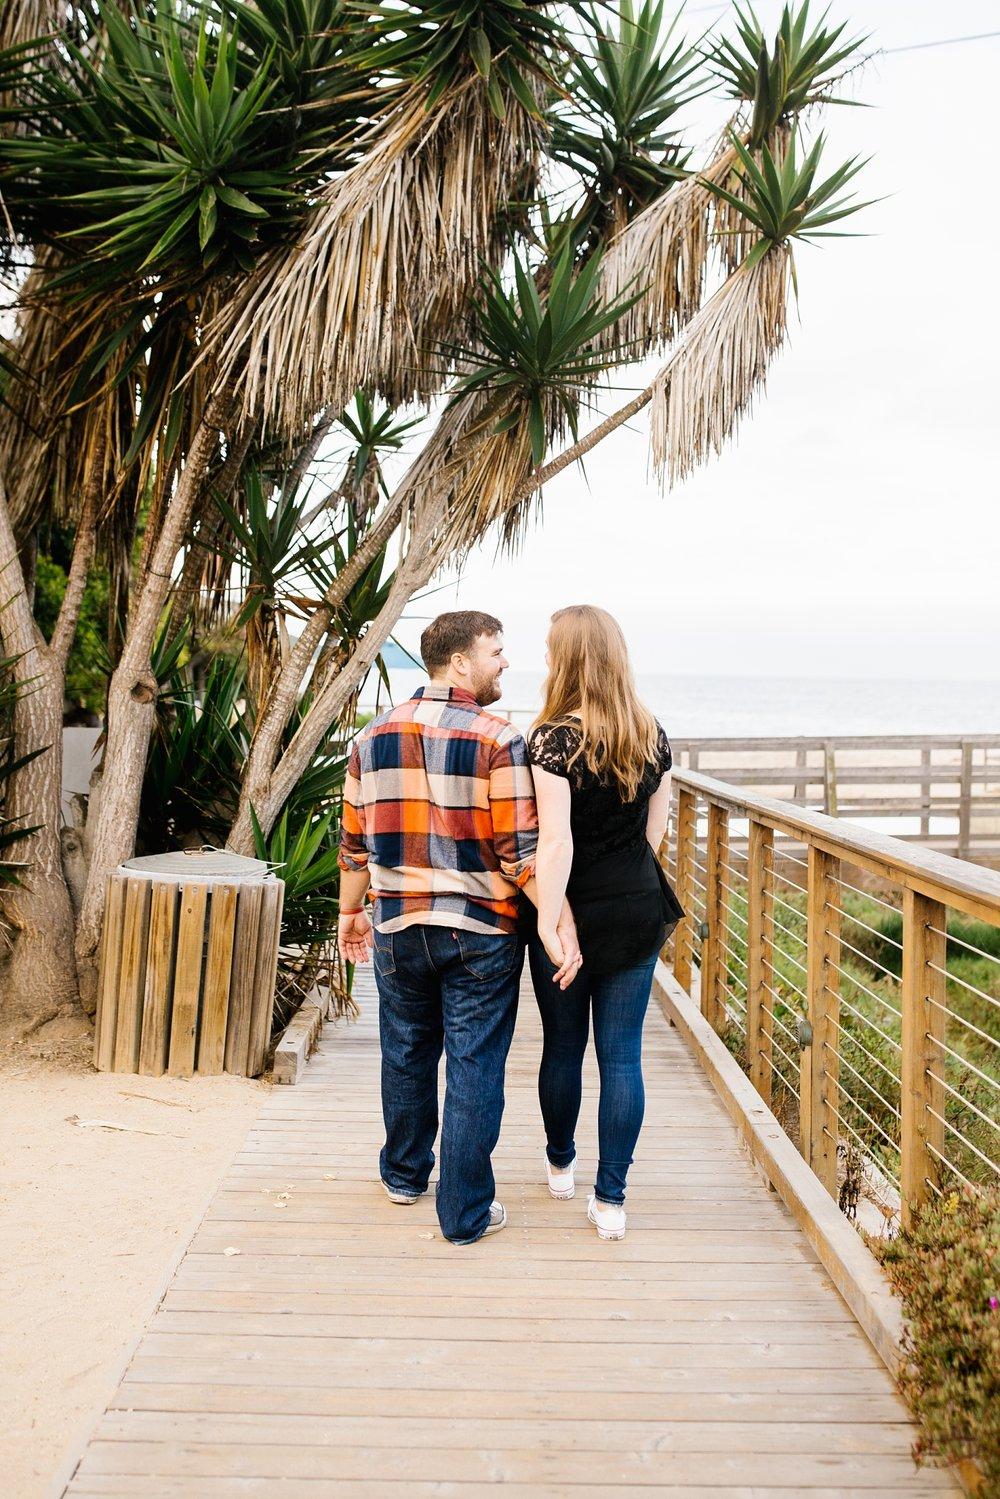 CassandraNathan-76E_Lizzie-B-Imagery-California-Wedding-Photographer-Crystal-Cove-Photography-Engagement-Session-Orange-County-Wedding-Photographer.jpg